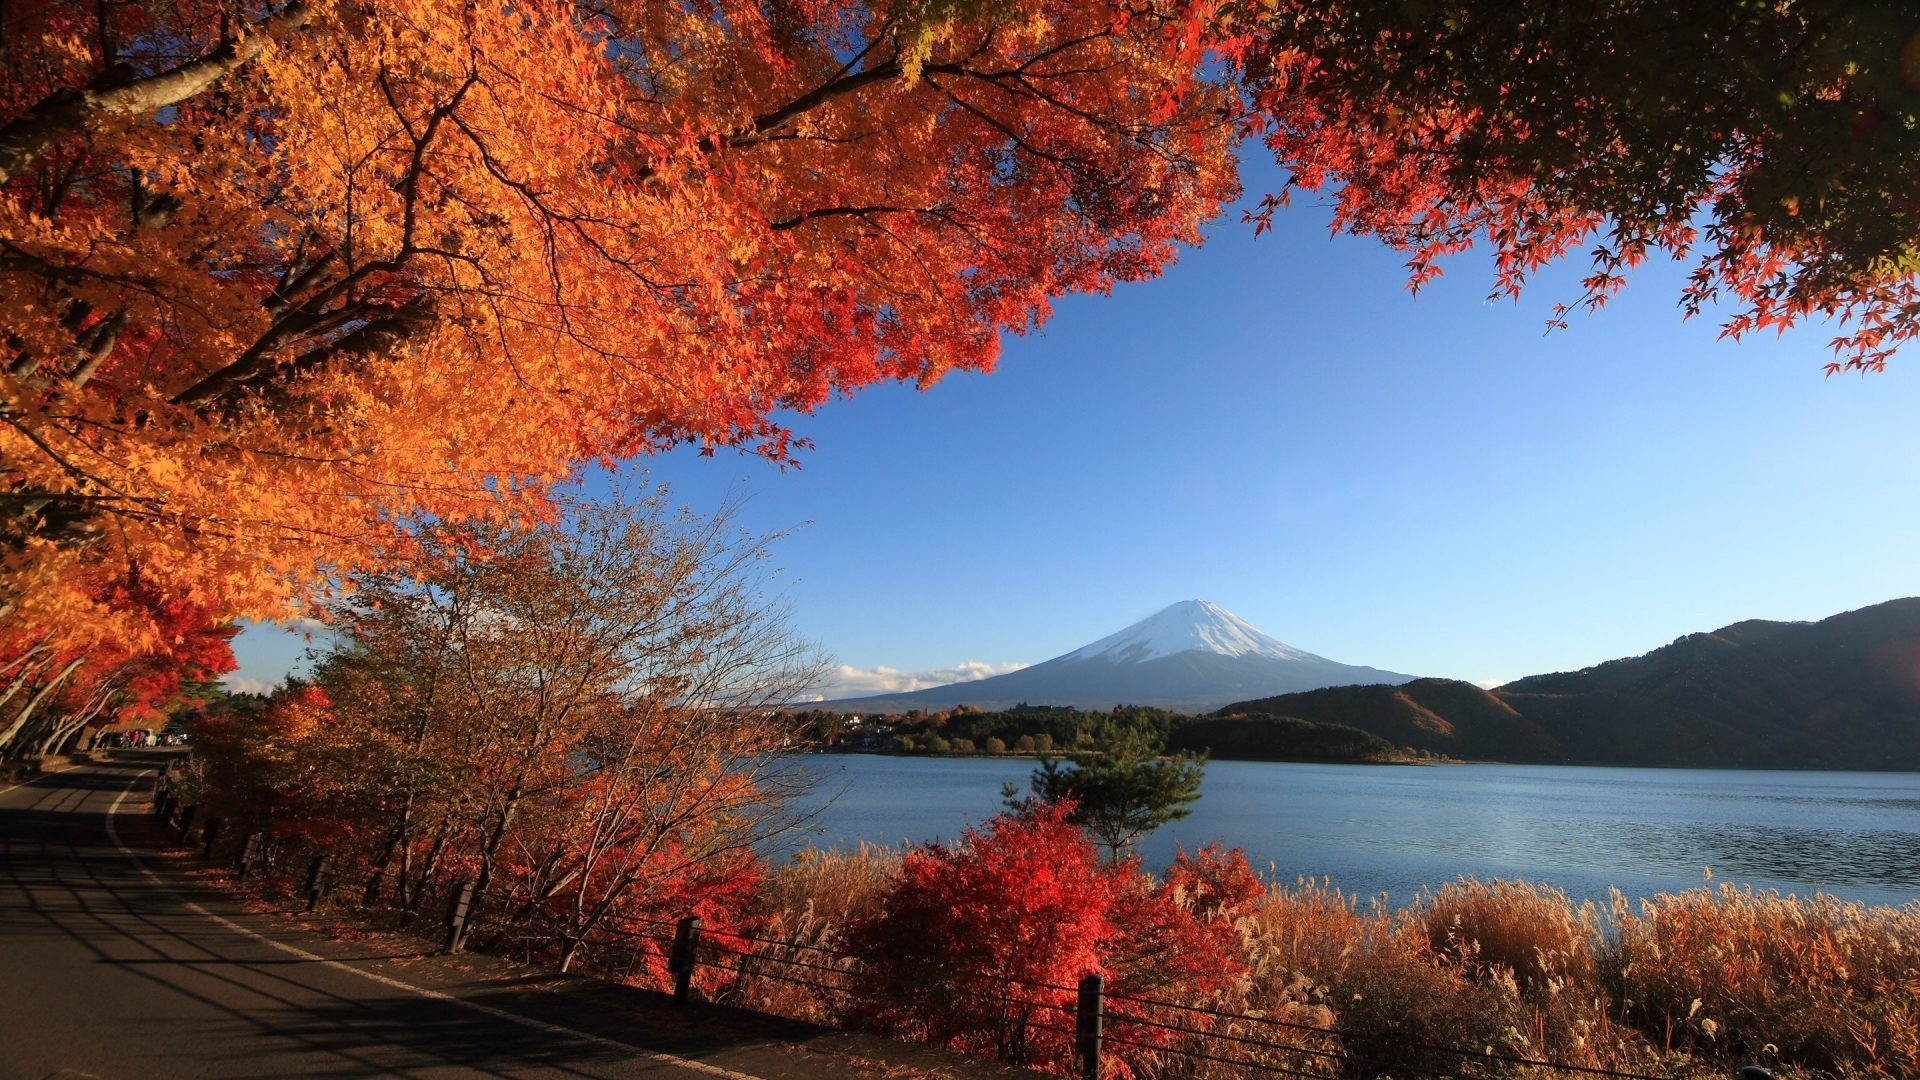 Fuji Tag – Nature Mountain Japanese Scenery San Lake Autumn Japan Fuji  Mobile Wallpapers for HD